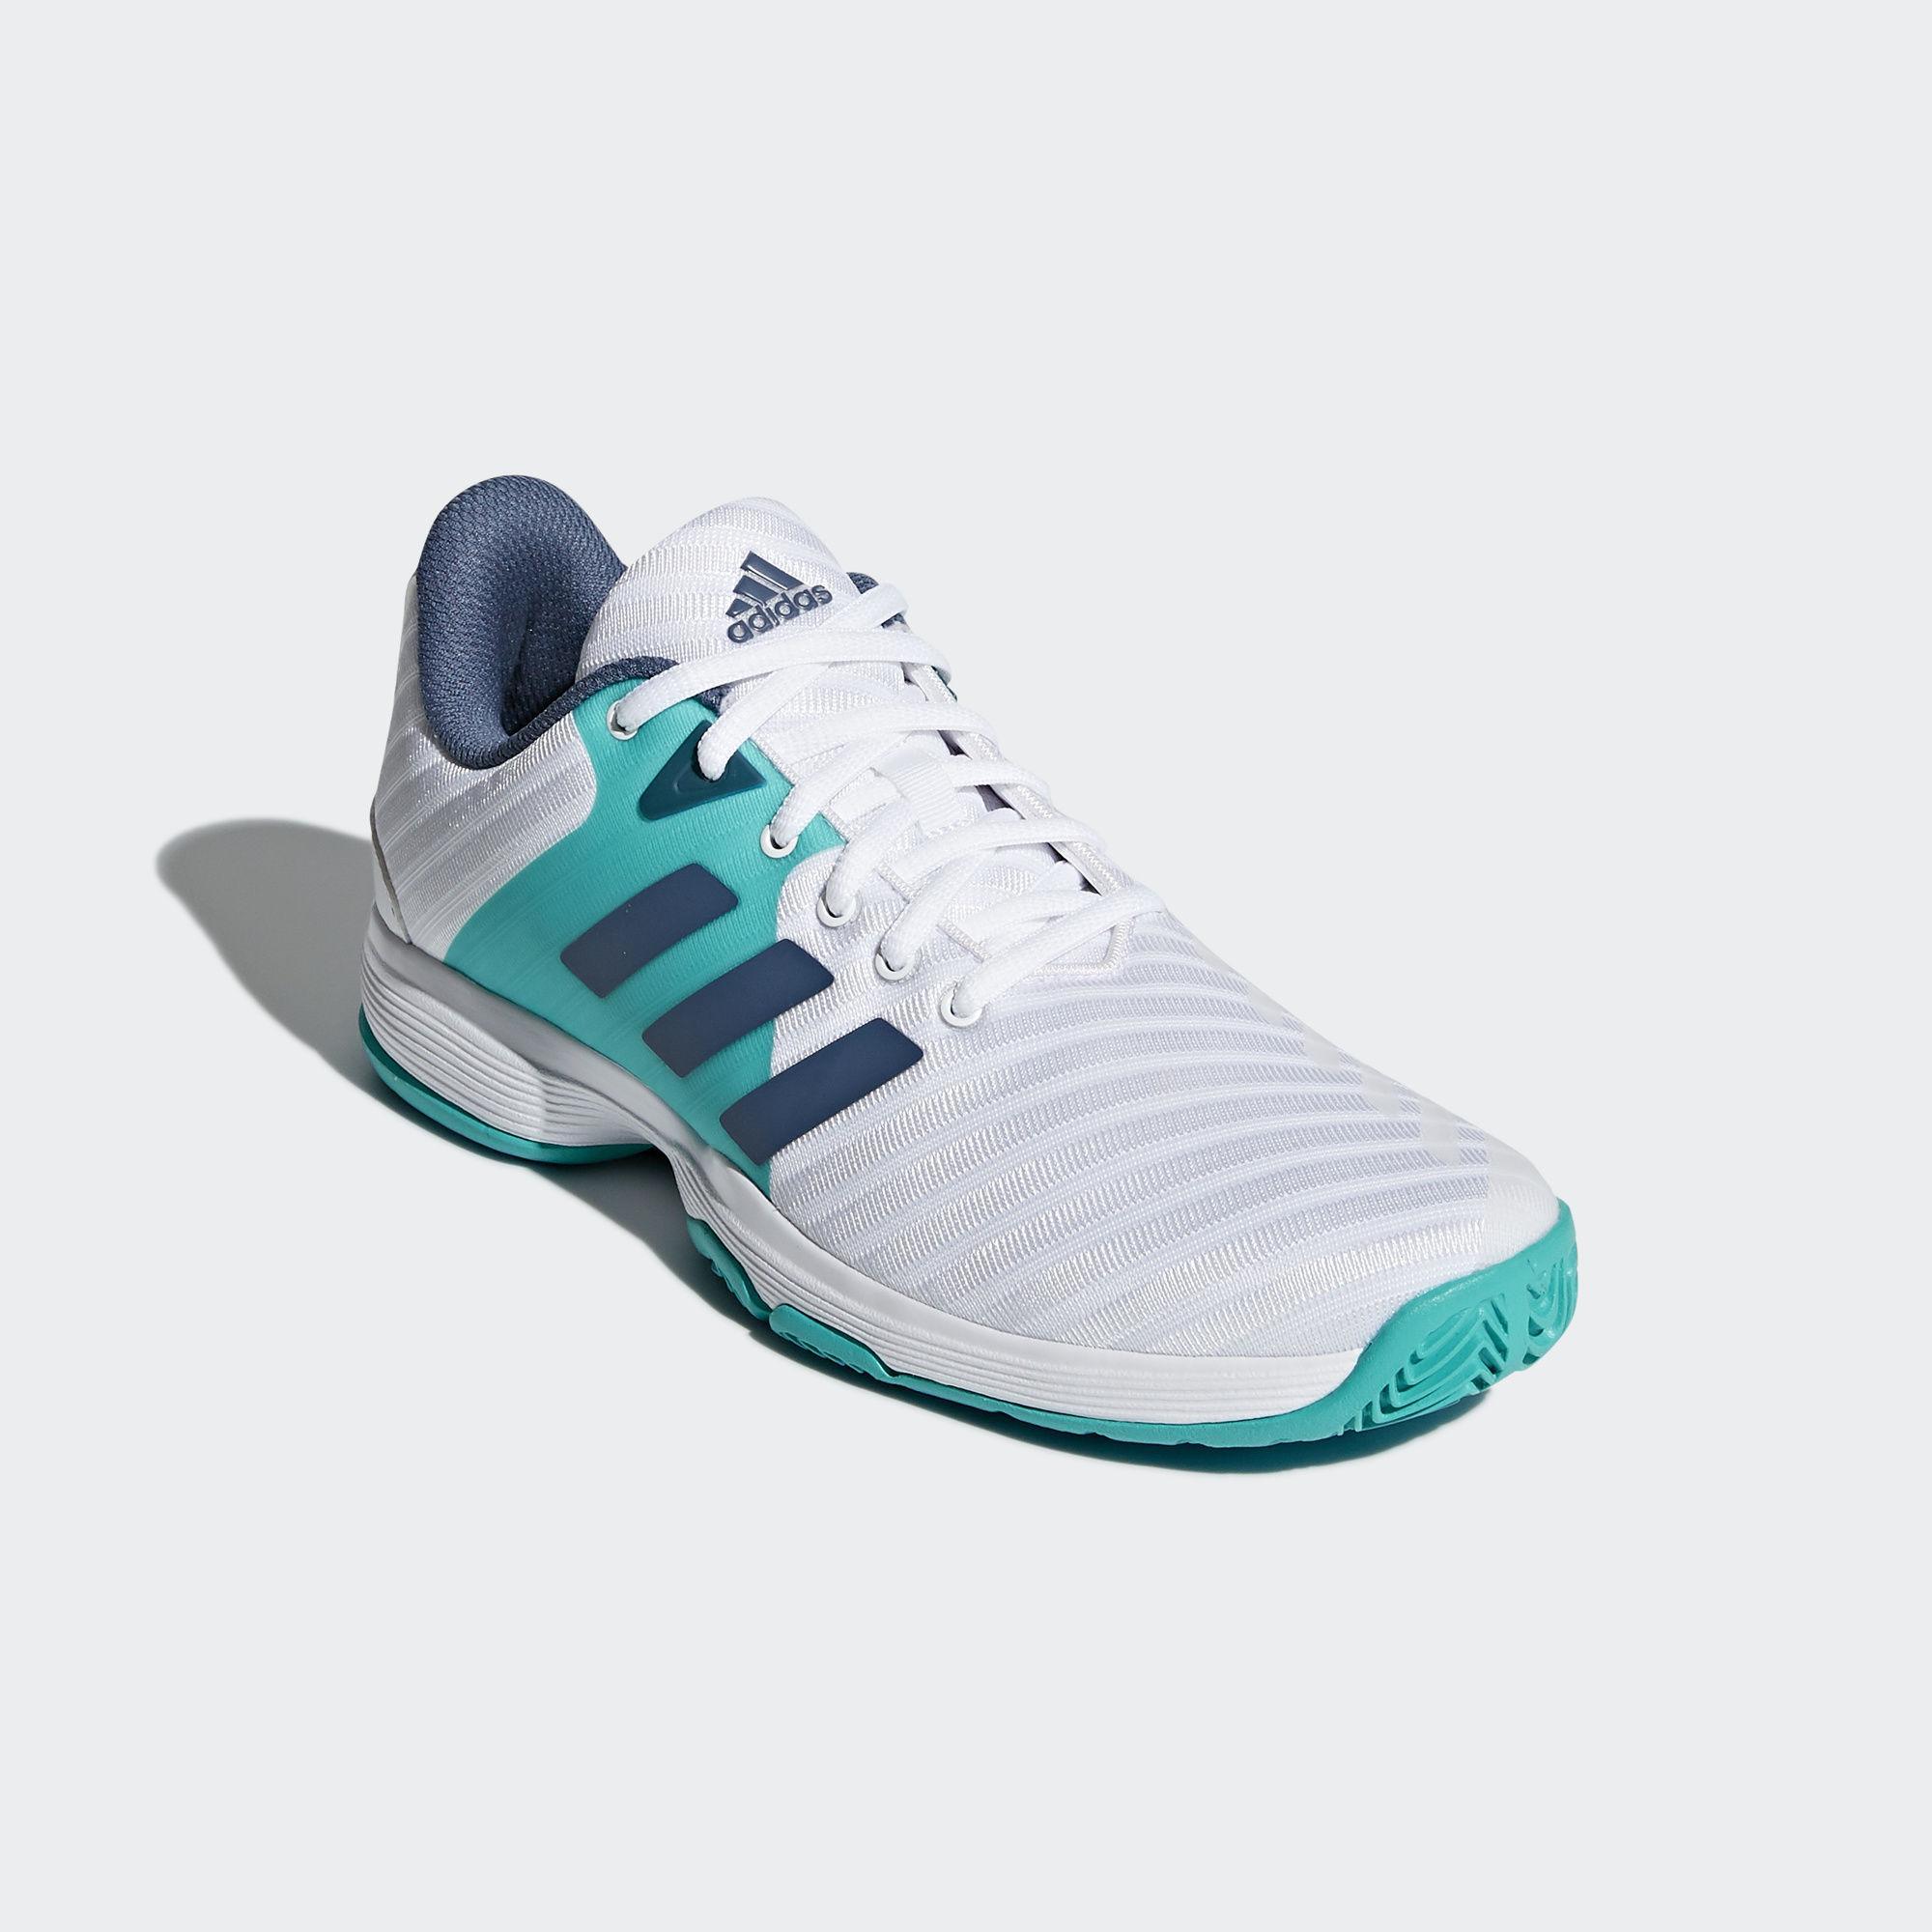 new product 478f8 128f8 Adidas womens barricade court tennis shoes white blue jpg 2000x2000 Adidas  womens tennis shoes blue